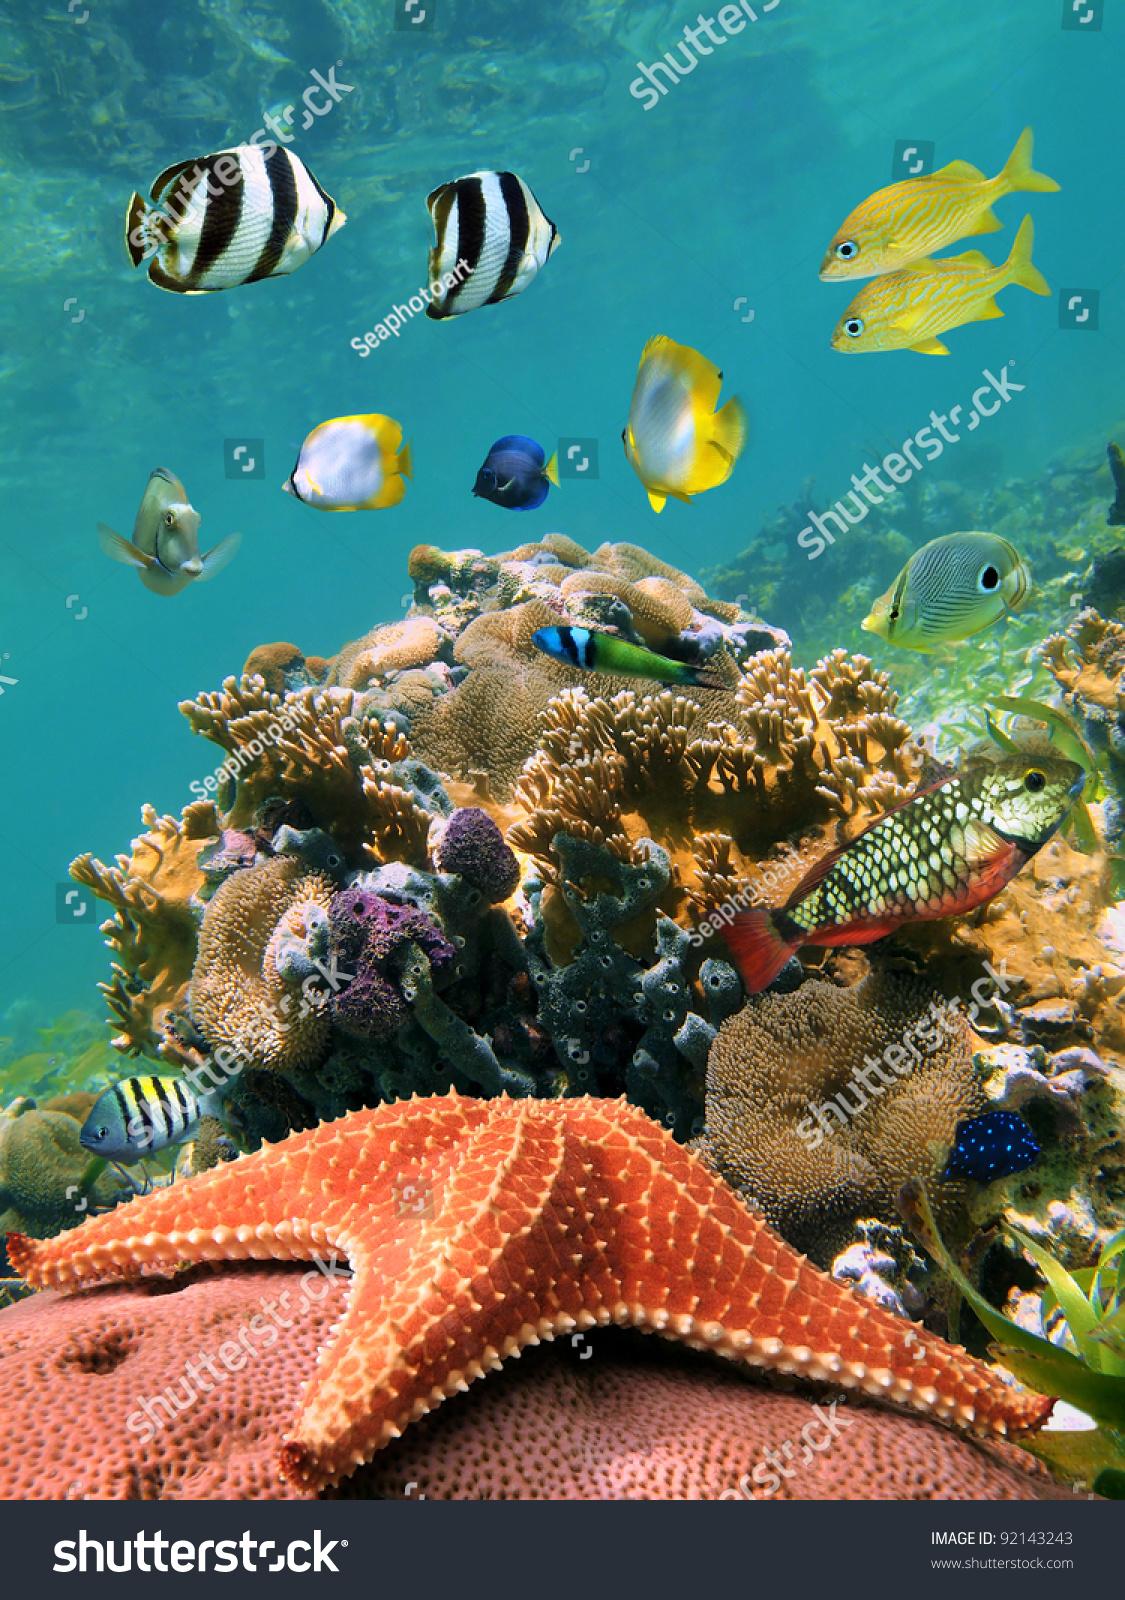 11 HOURS Stunning 4K Underwater footage + Music | Nature ... |Colorful Underwater Life